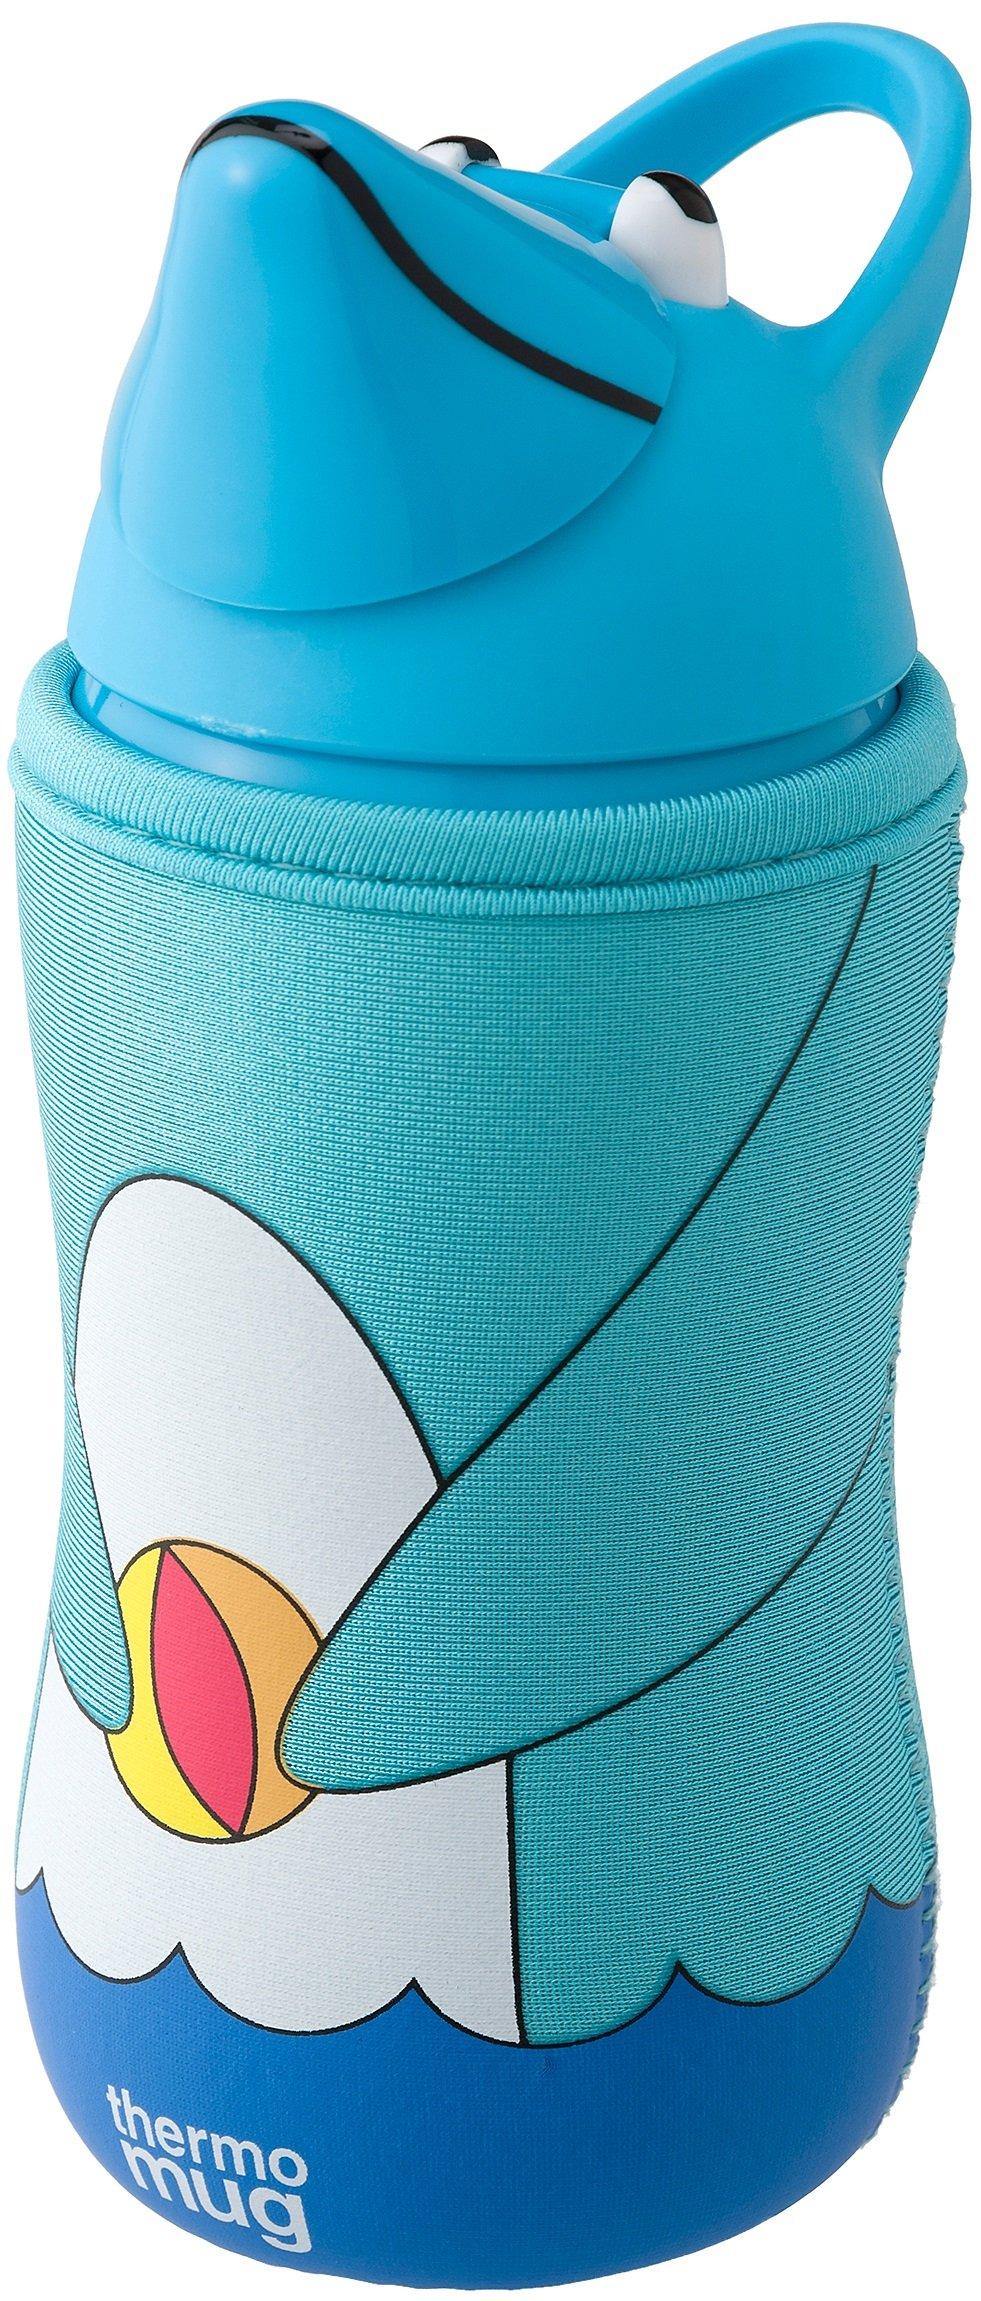 Thermo Mug Animal bottle (Dolphin) Marin 5155AM (japan import) by THERMO MUG by Thermomug